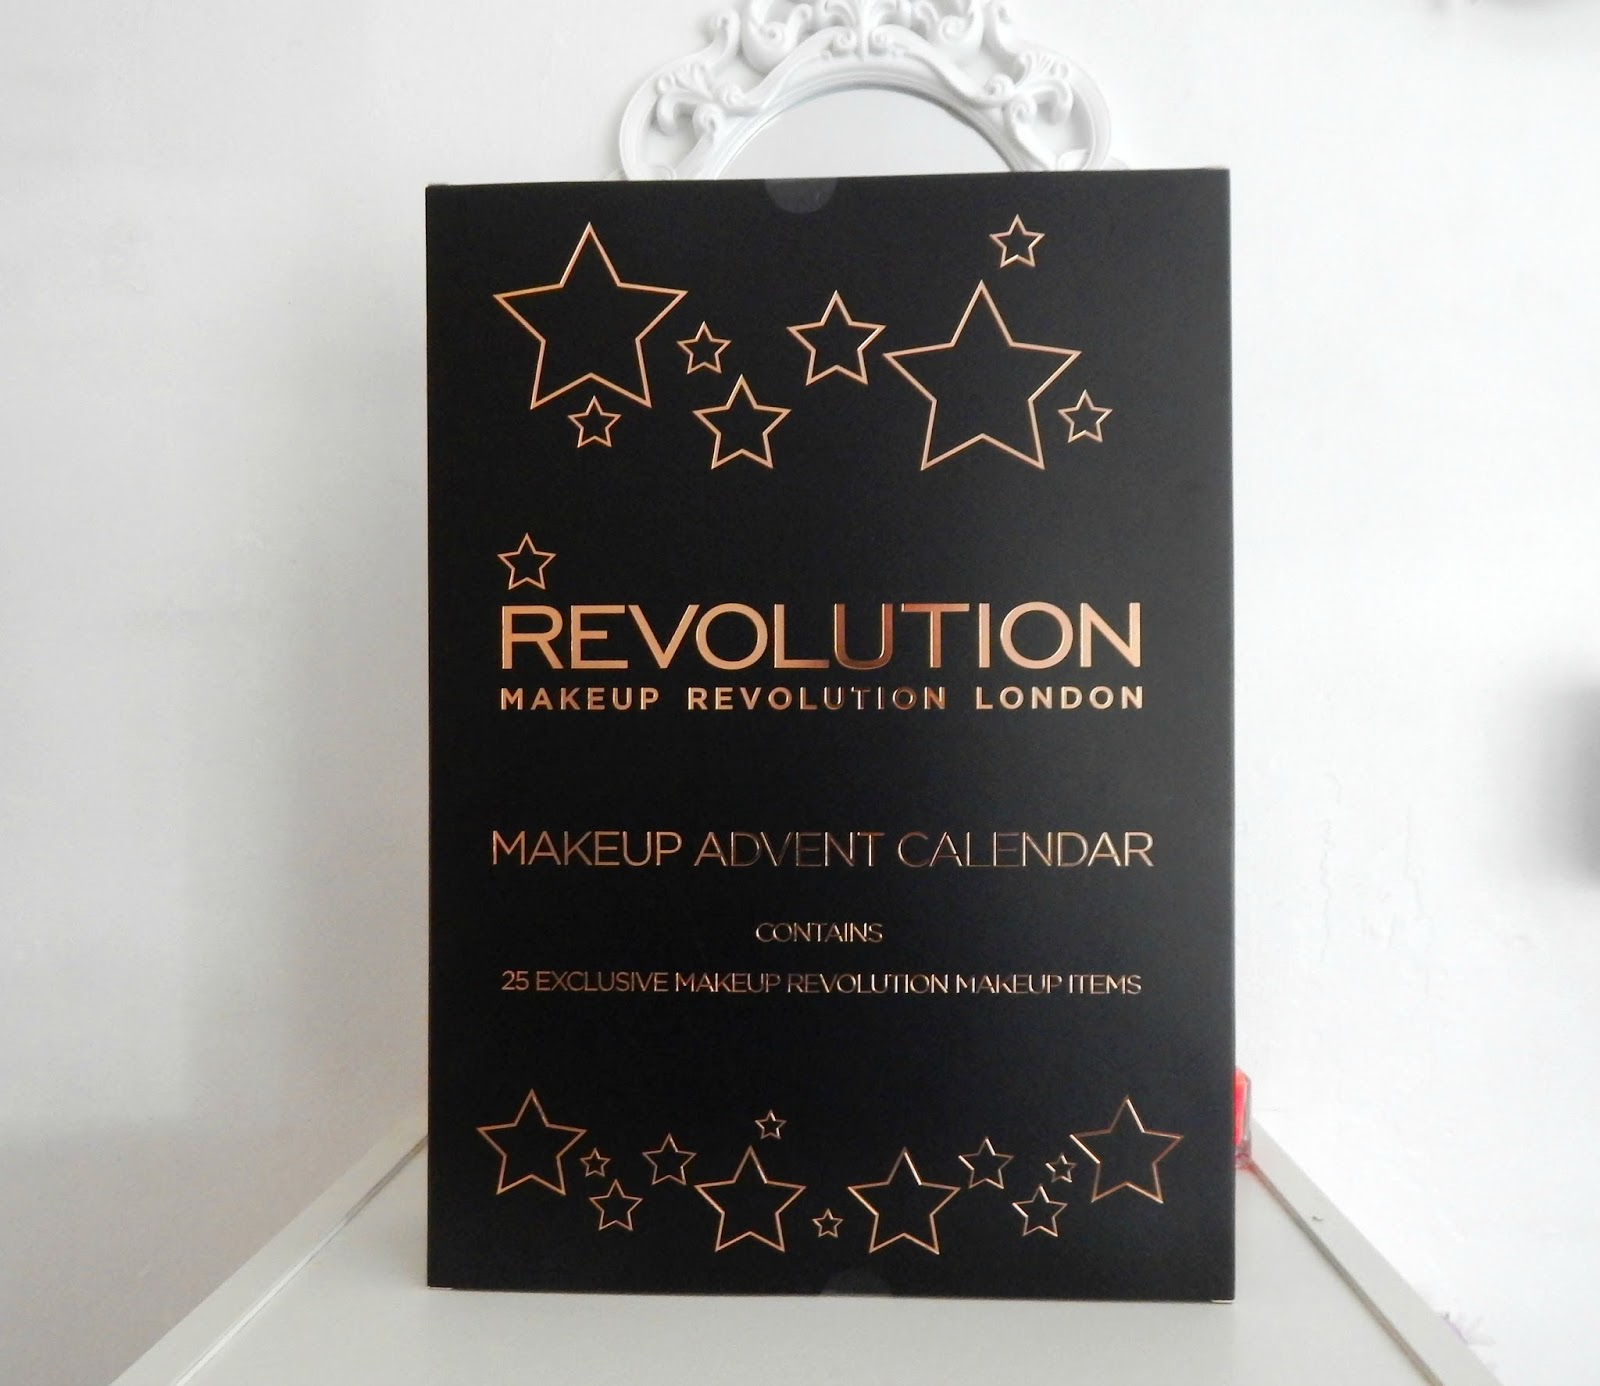 Revolution makeup london advent calendar